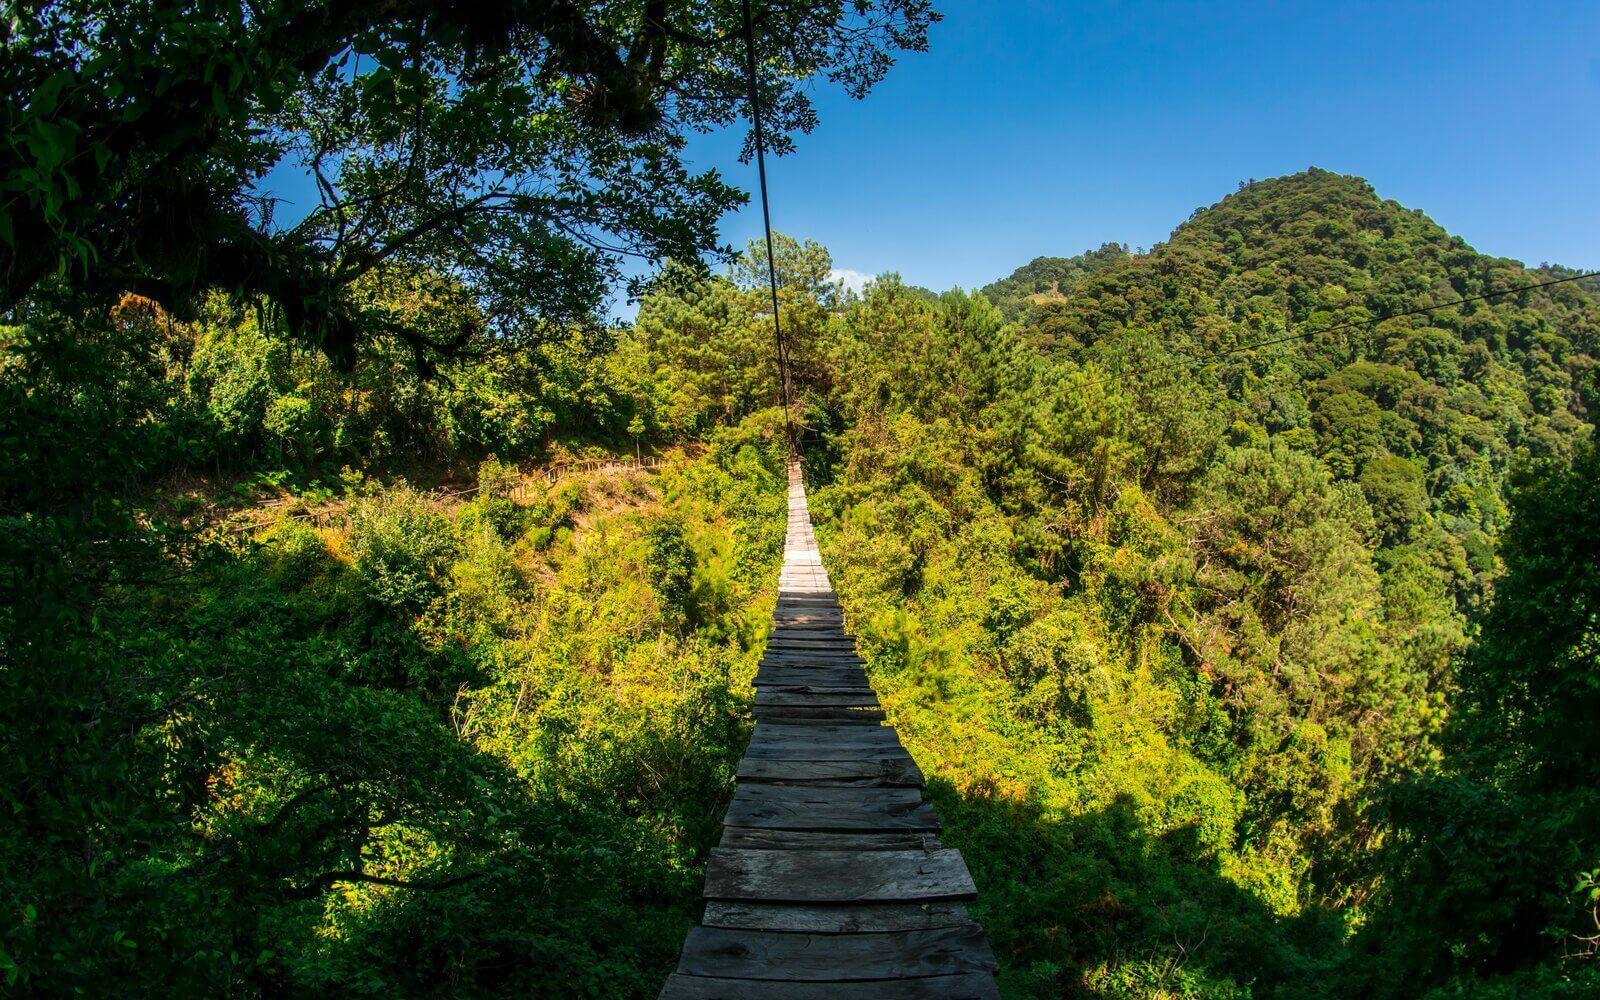 Parque Ecológico Pino Dulce